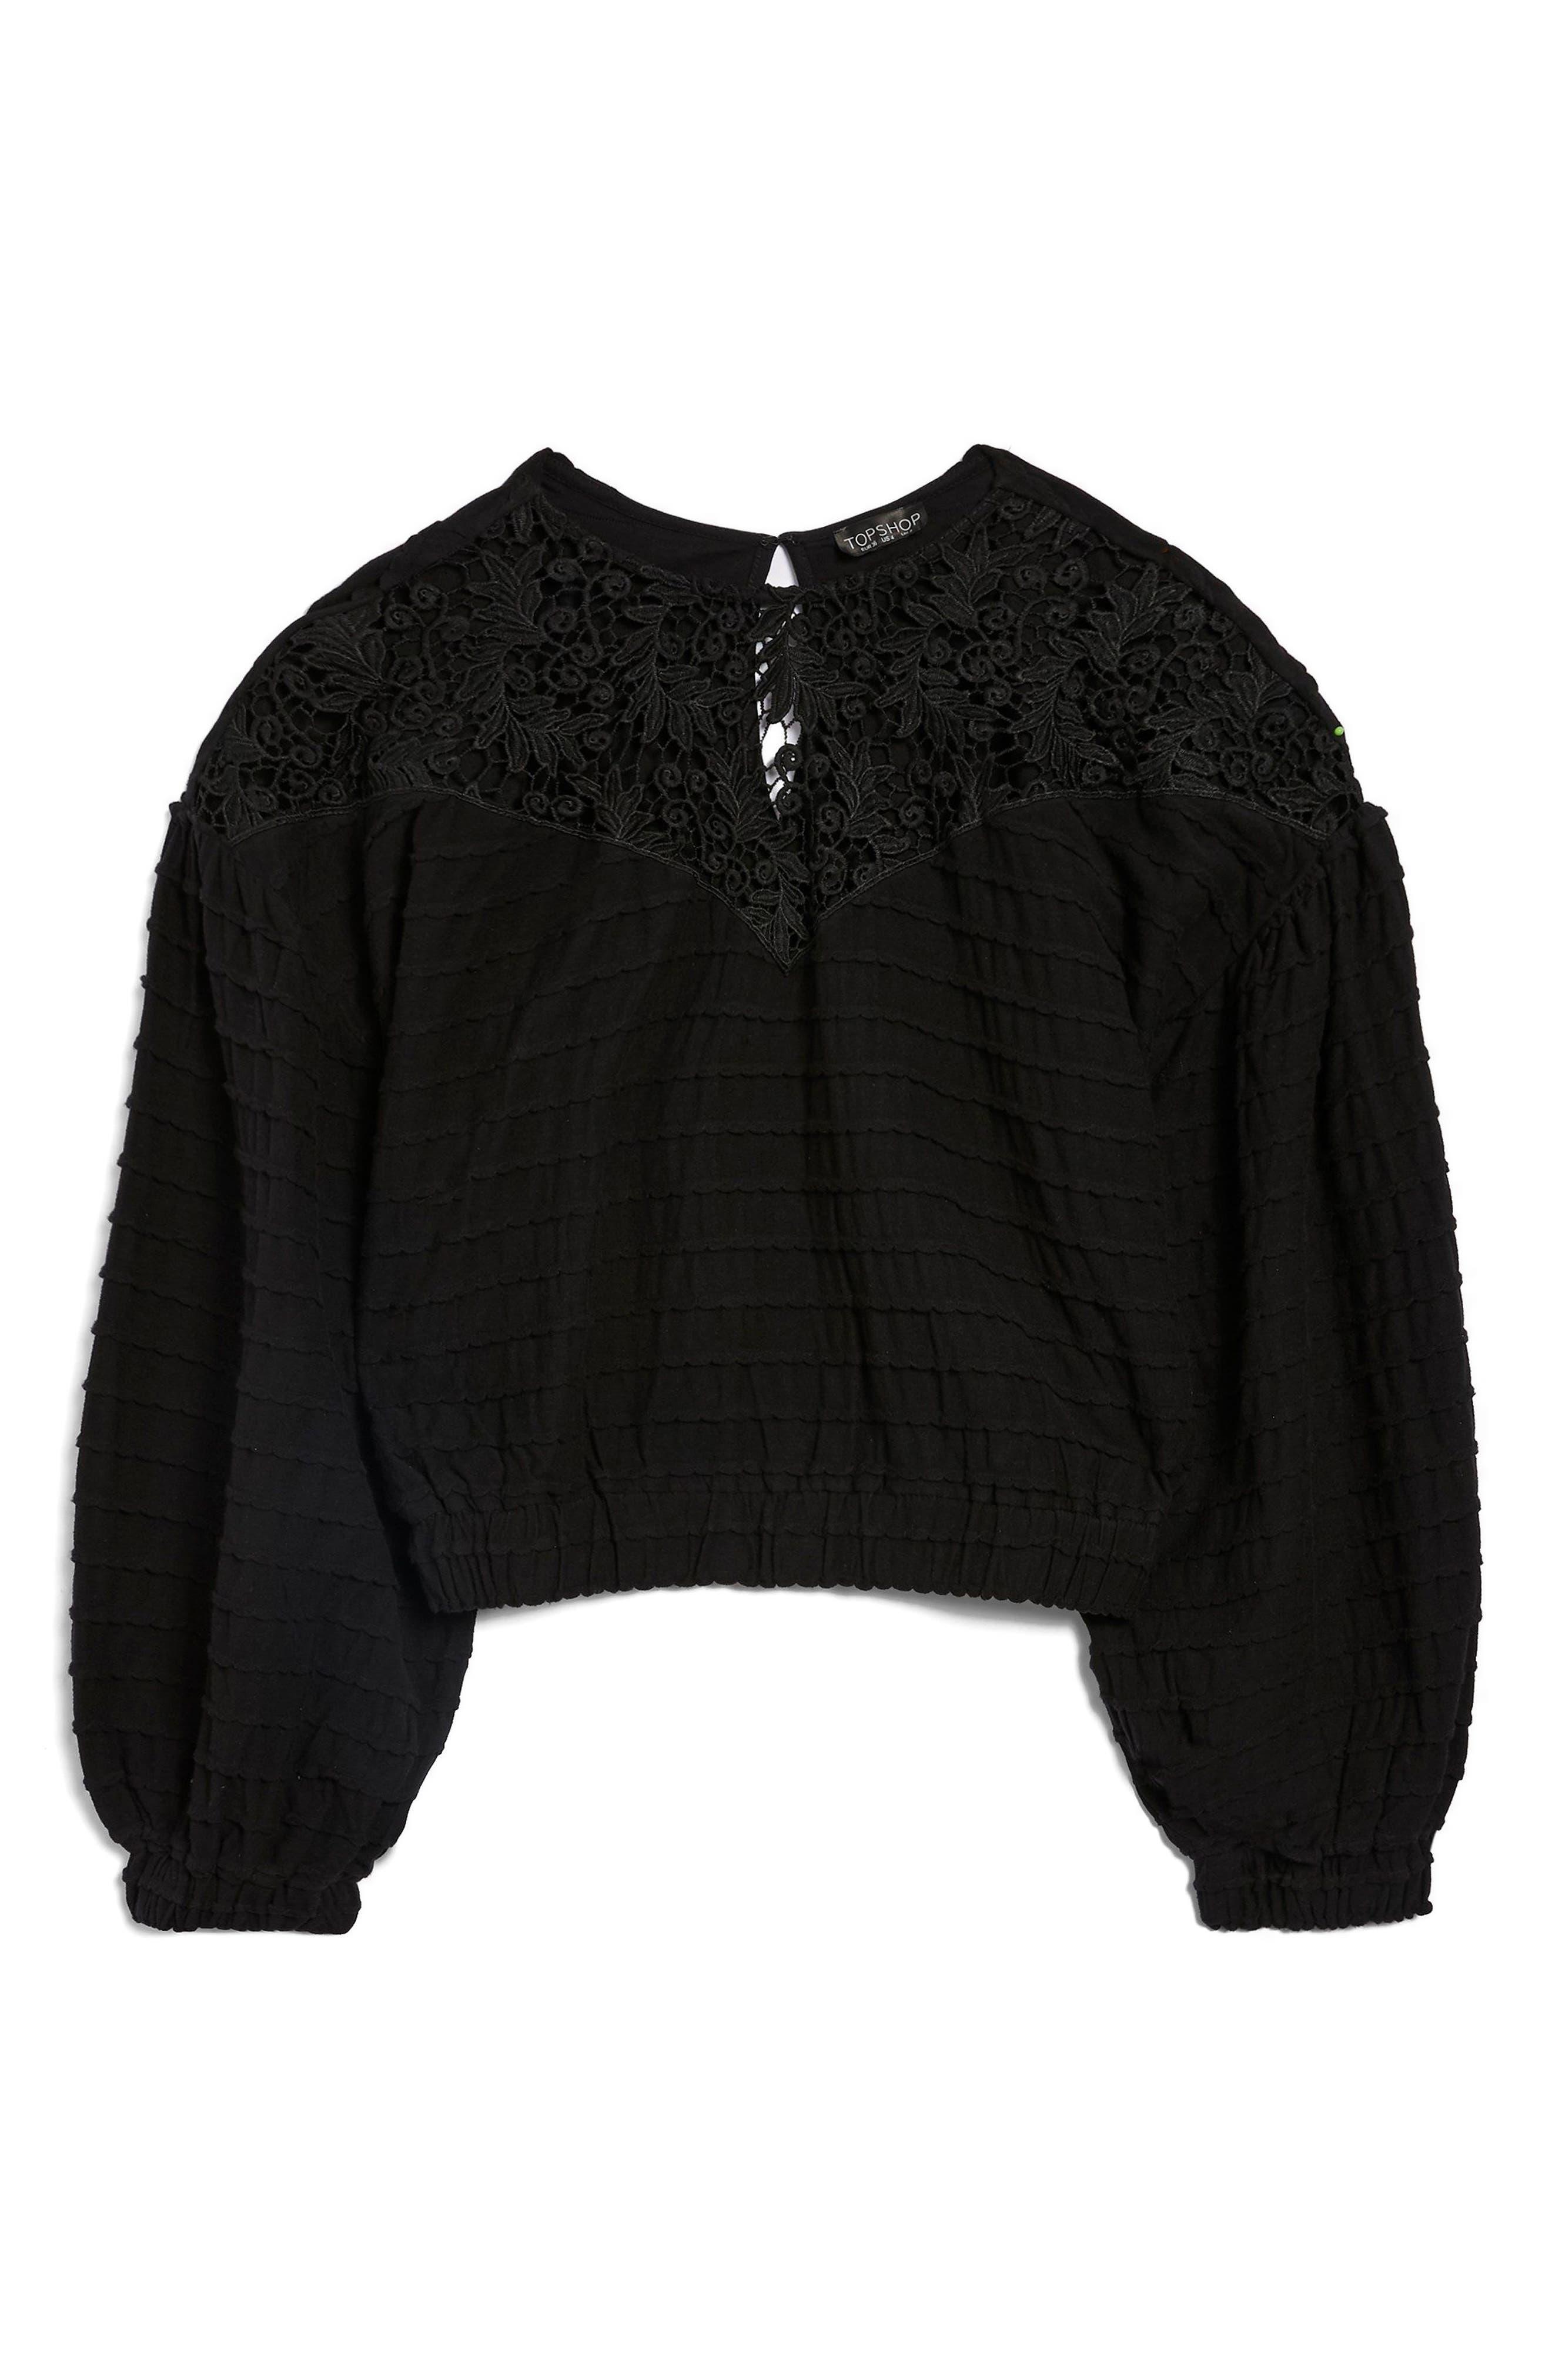 Crochet Inset Top,                             Alternate thumbnail 4, color,                             Black